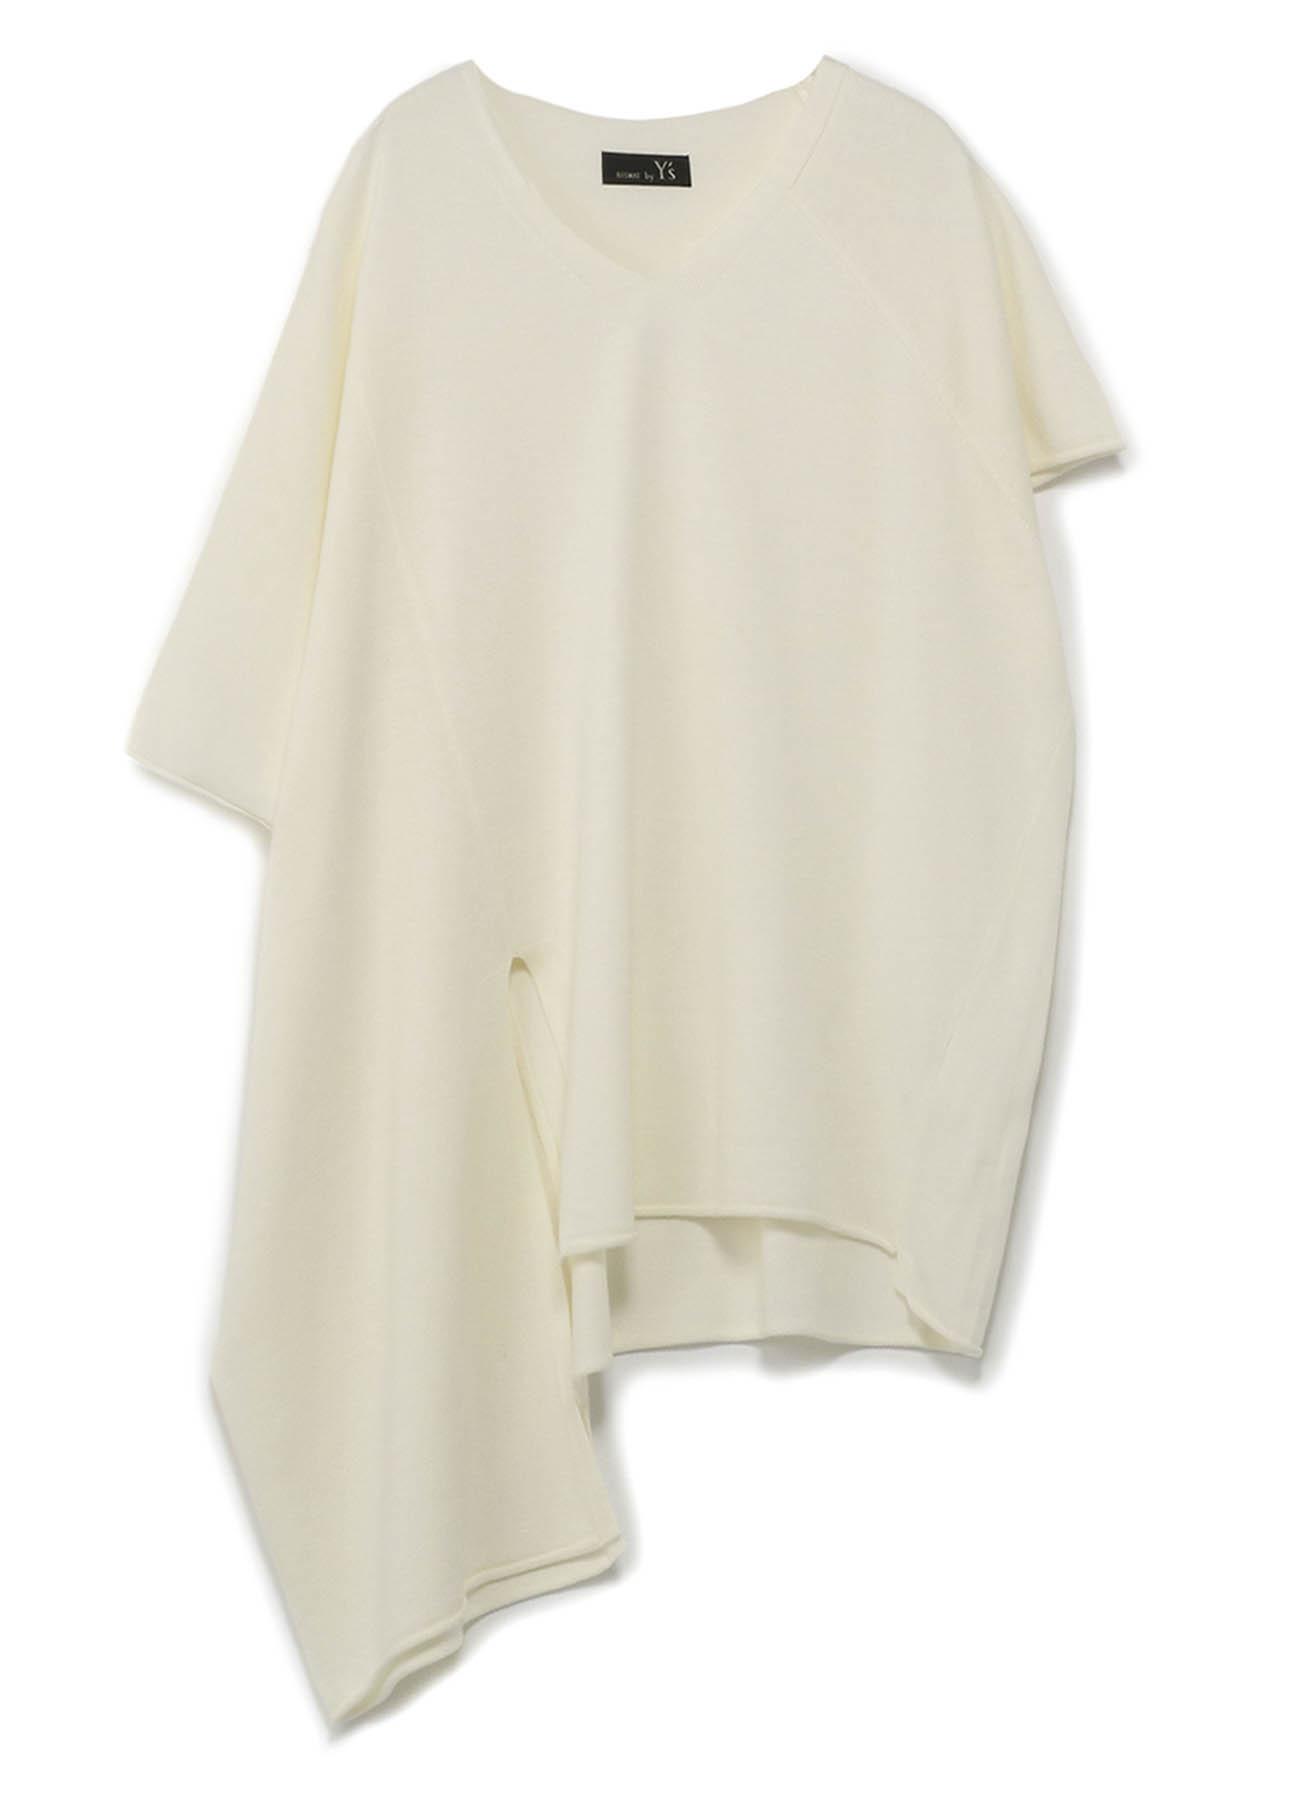 RISMATby Y's丙烯酸棉度Amatenji不对称针织T恤